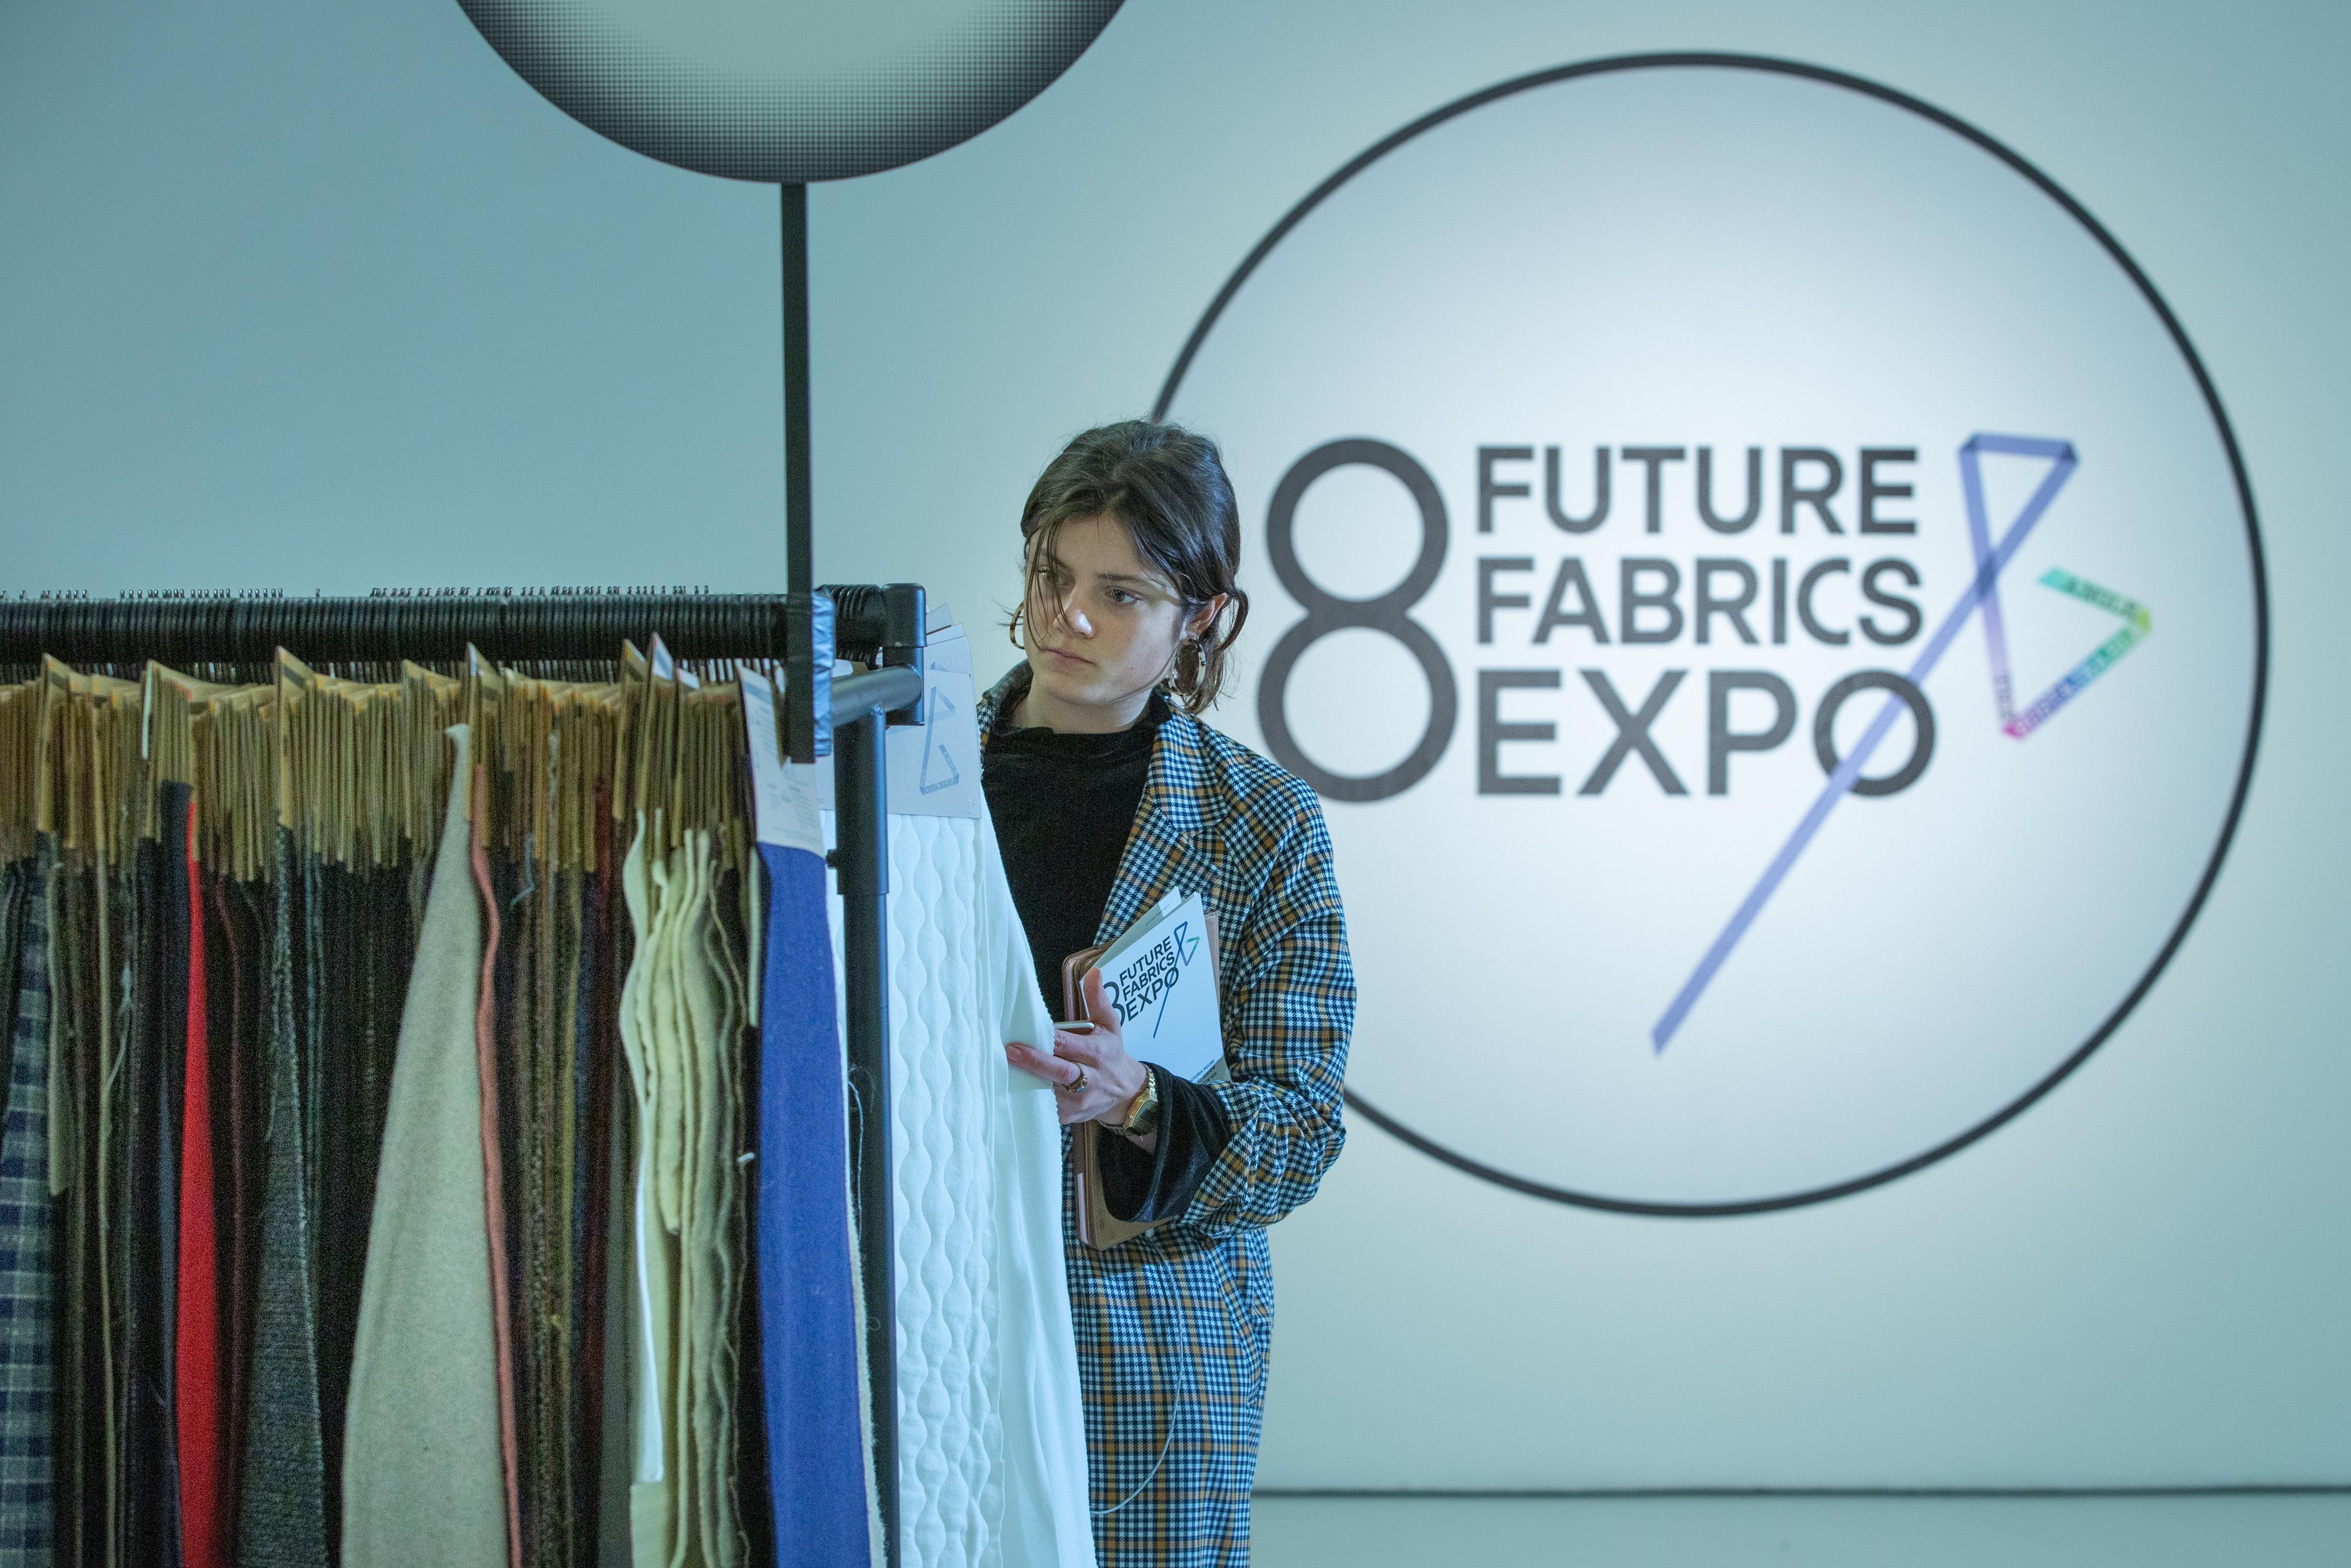 Future Fabrics Expo | The Sustainable Angle